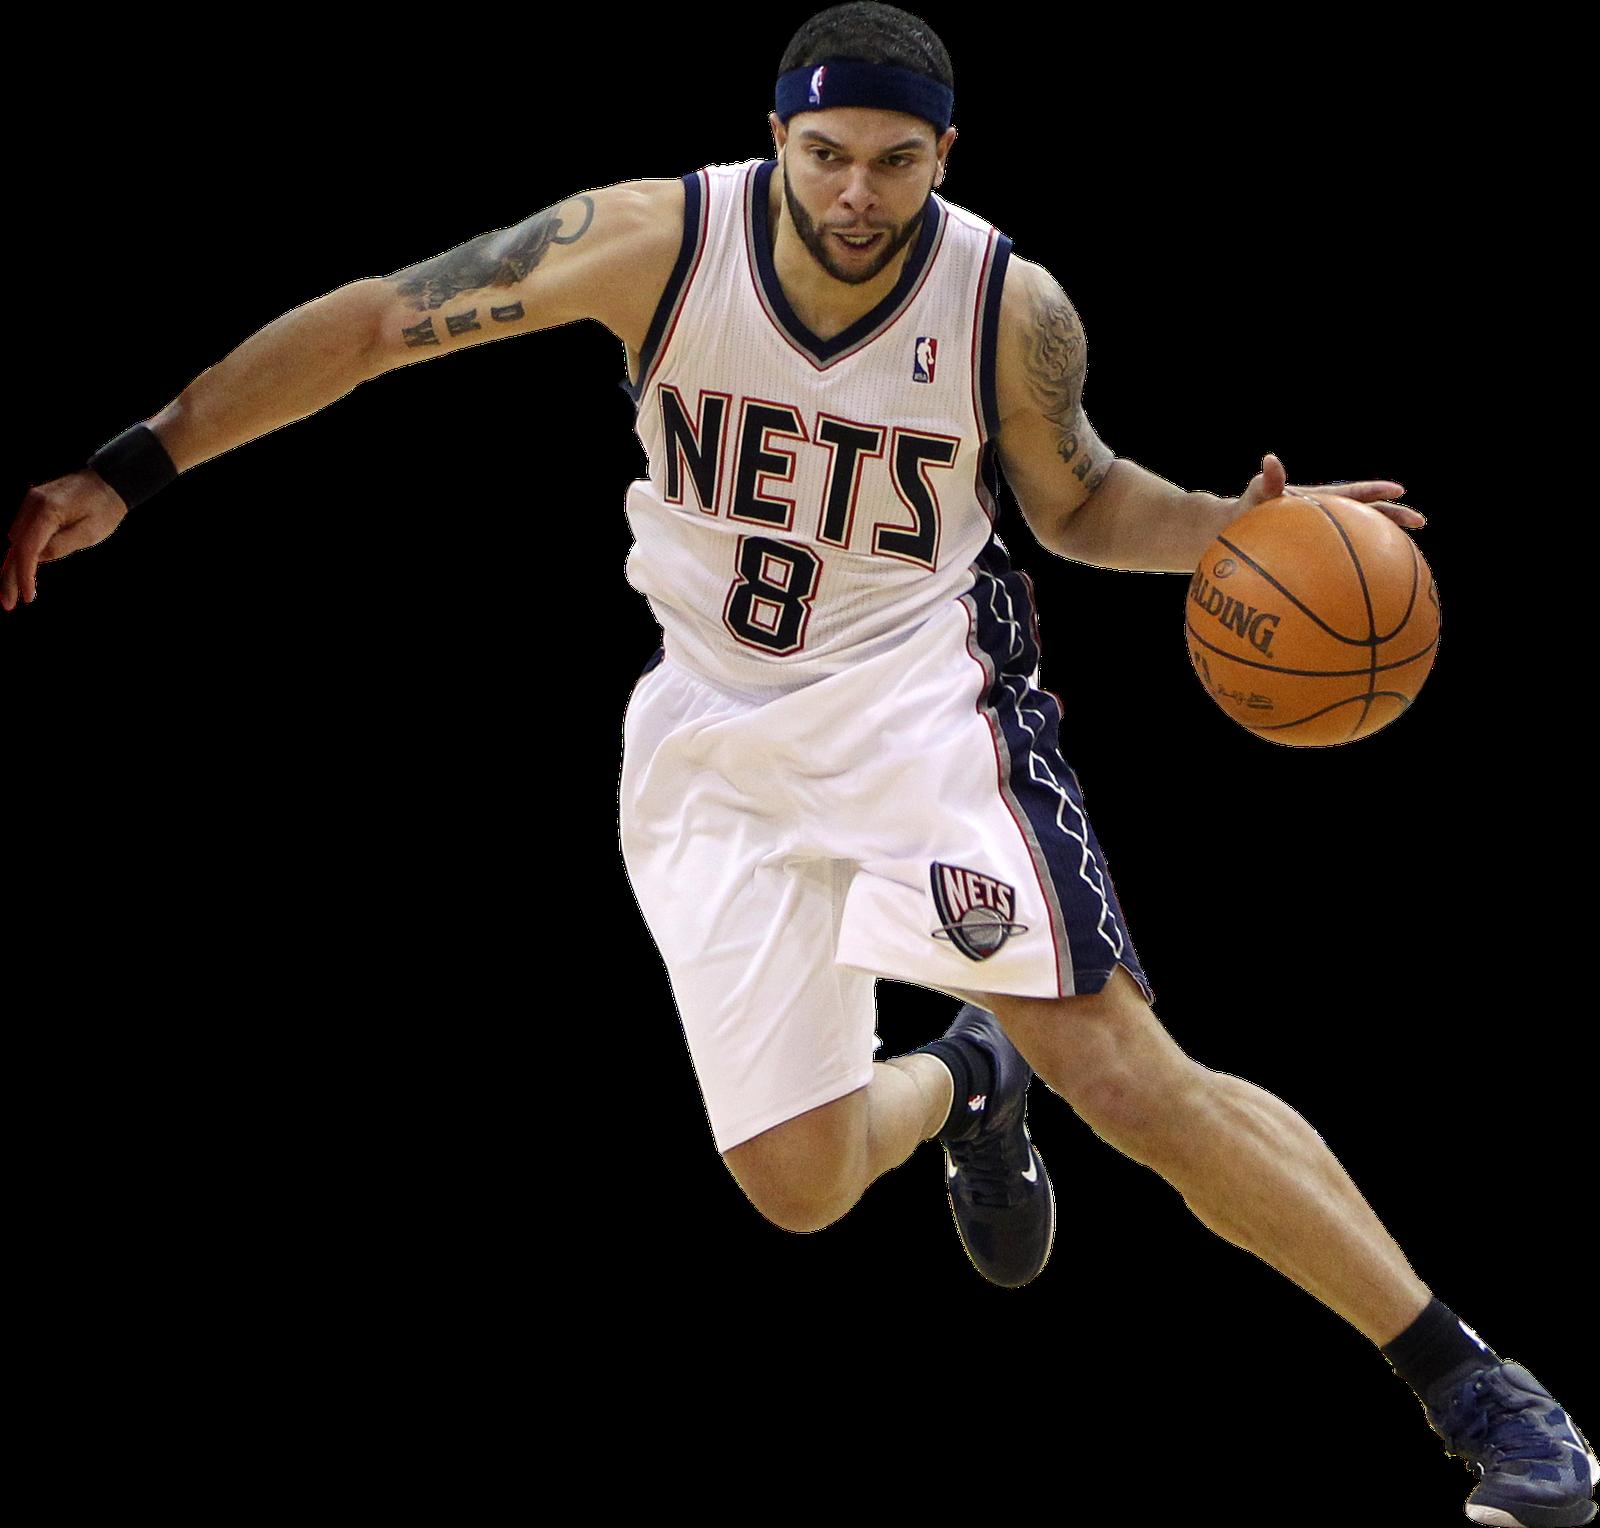 Basketball match clipart vector transparent que nivel Marivel | Jugadores de baloncesto | Pinterest vector transparent